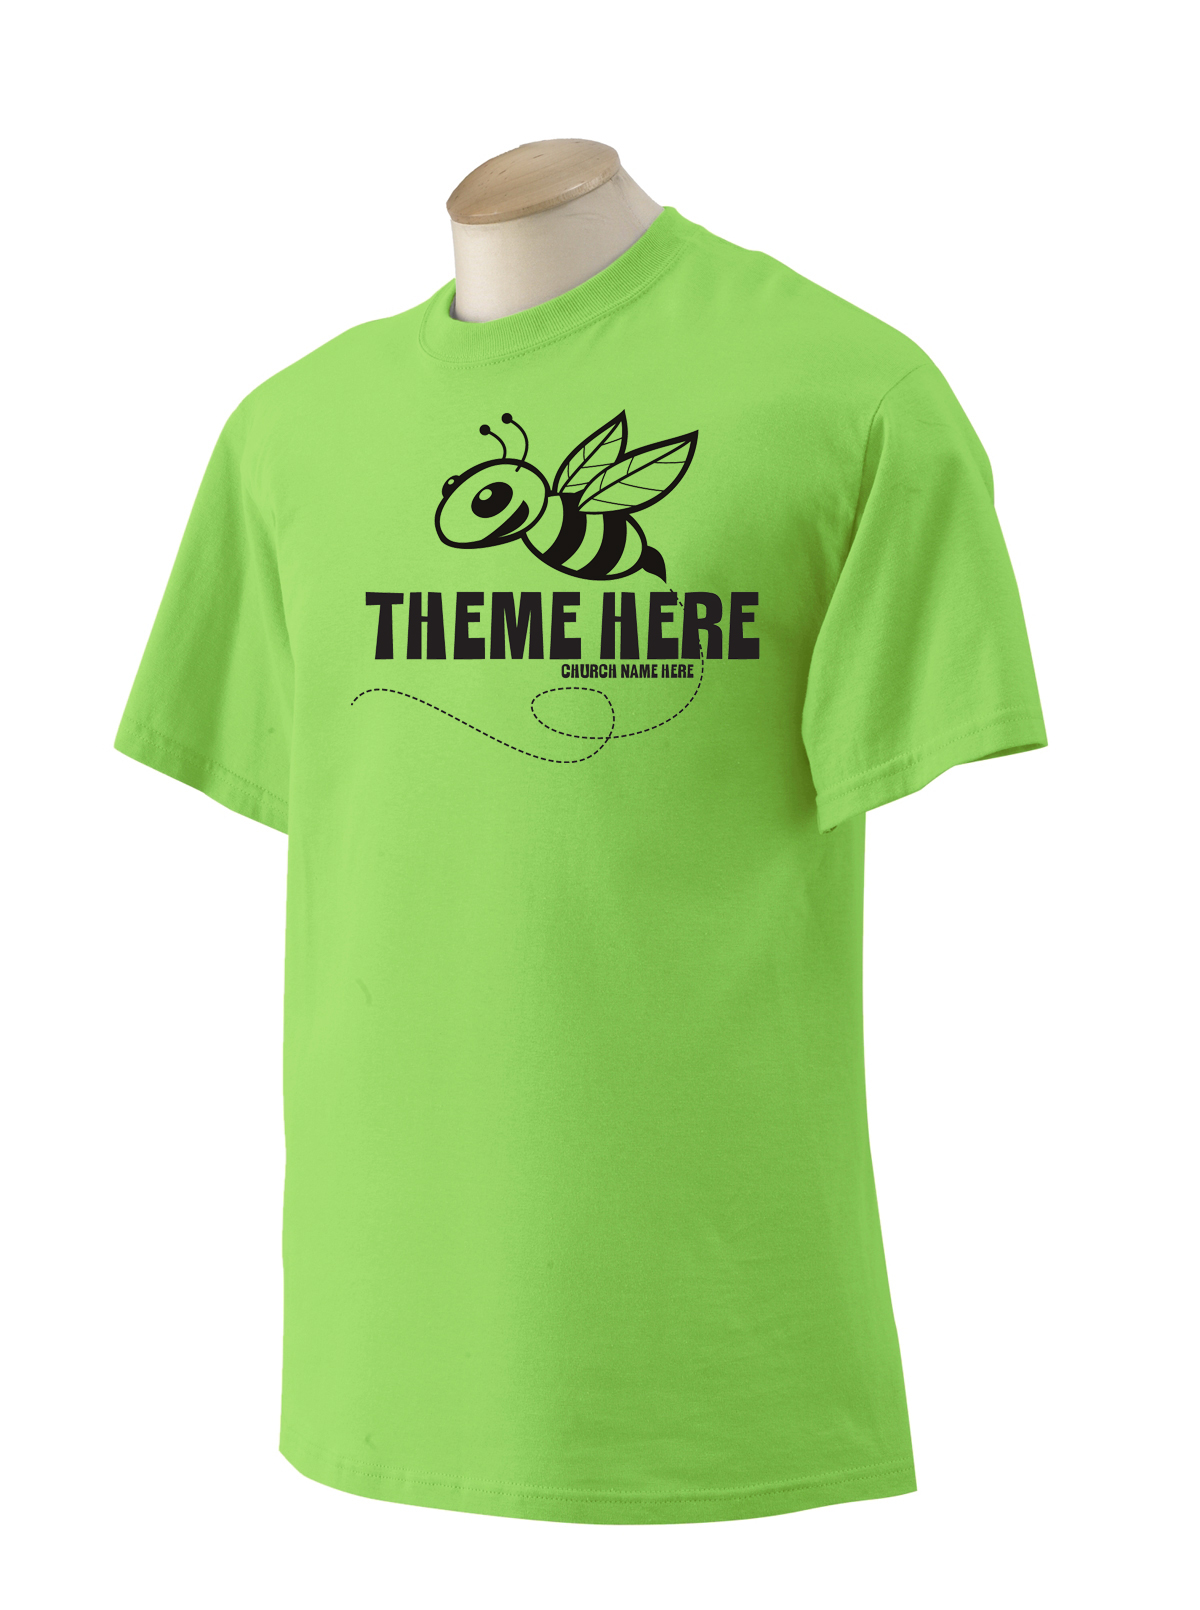 Bee 2 Lime Shirt.jpg